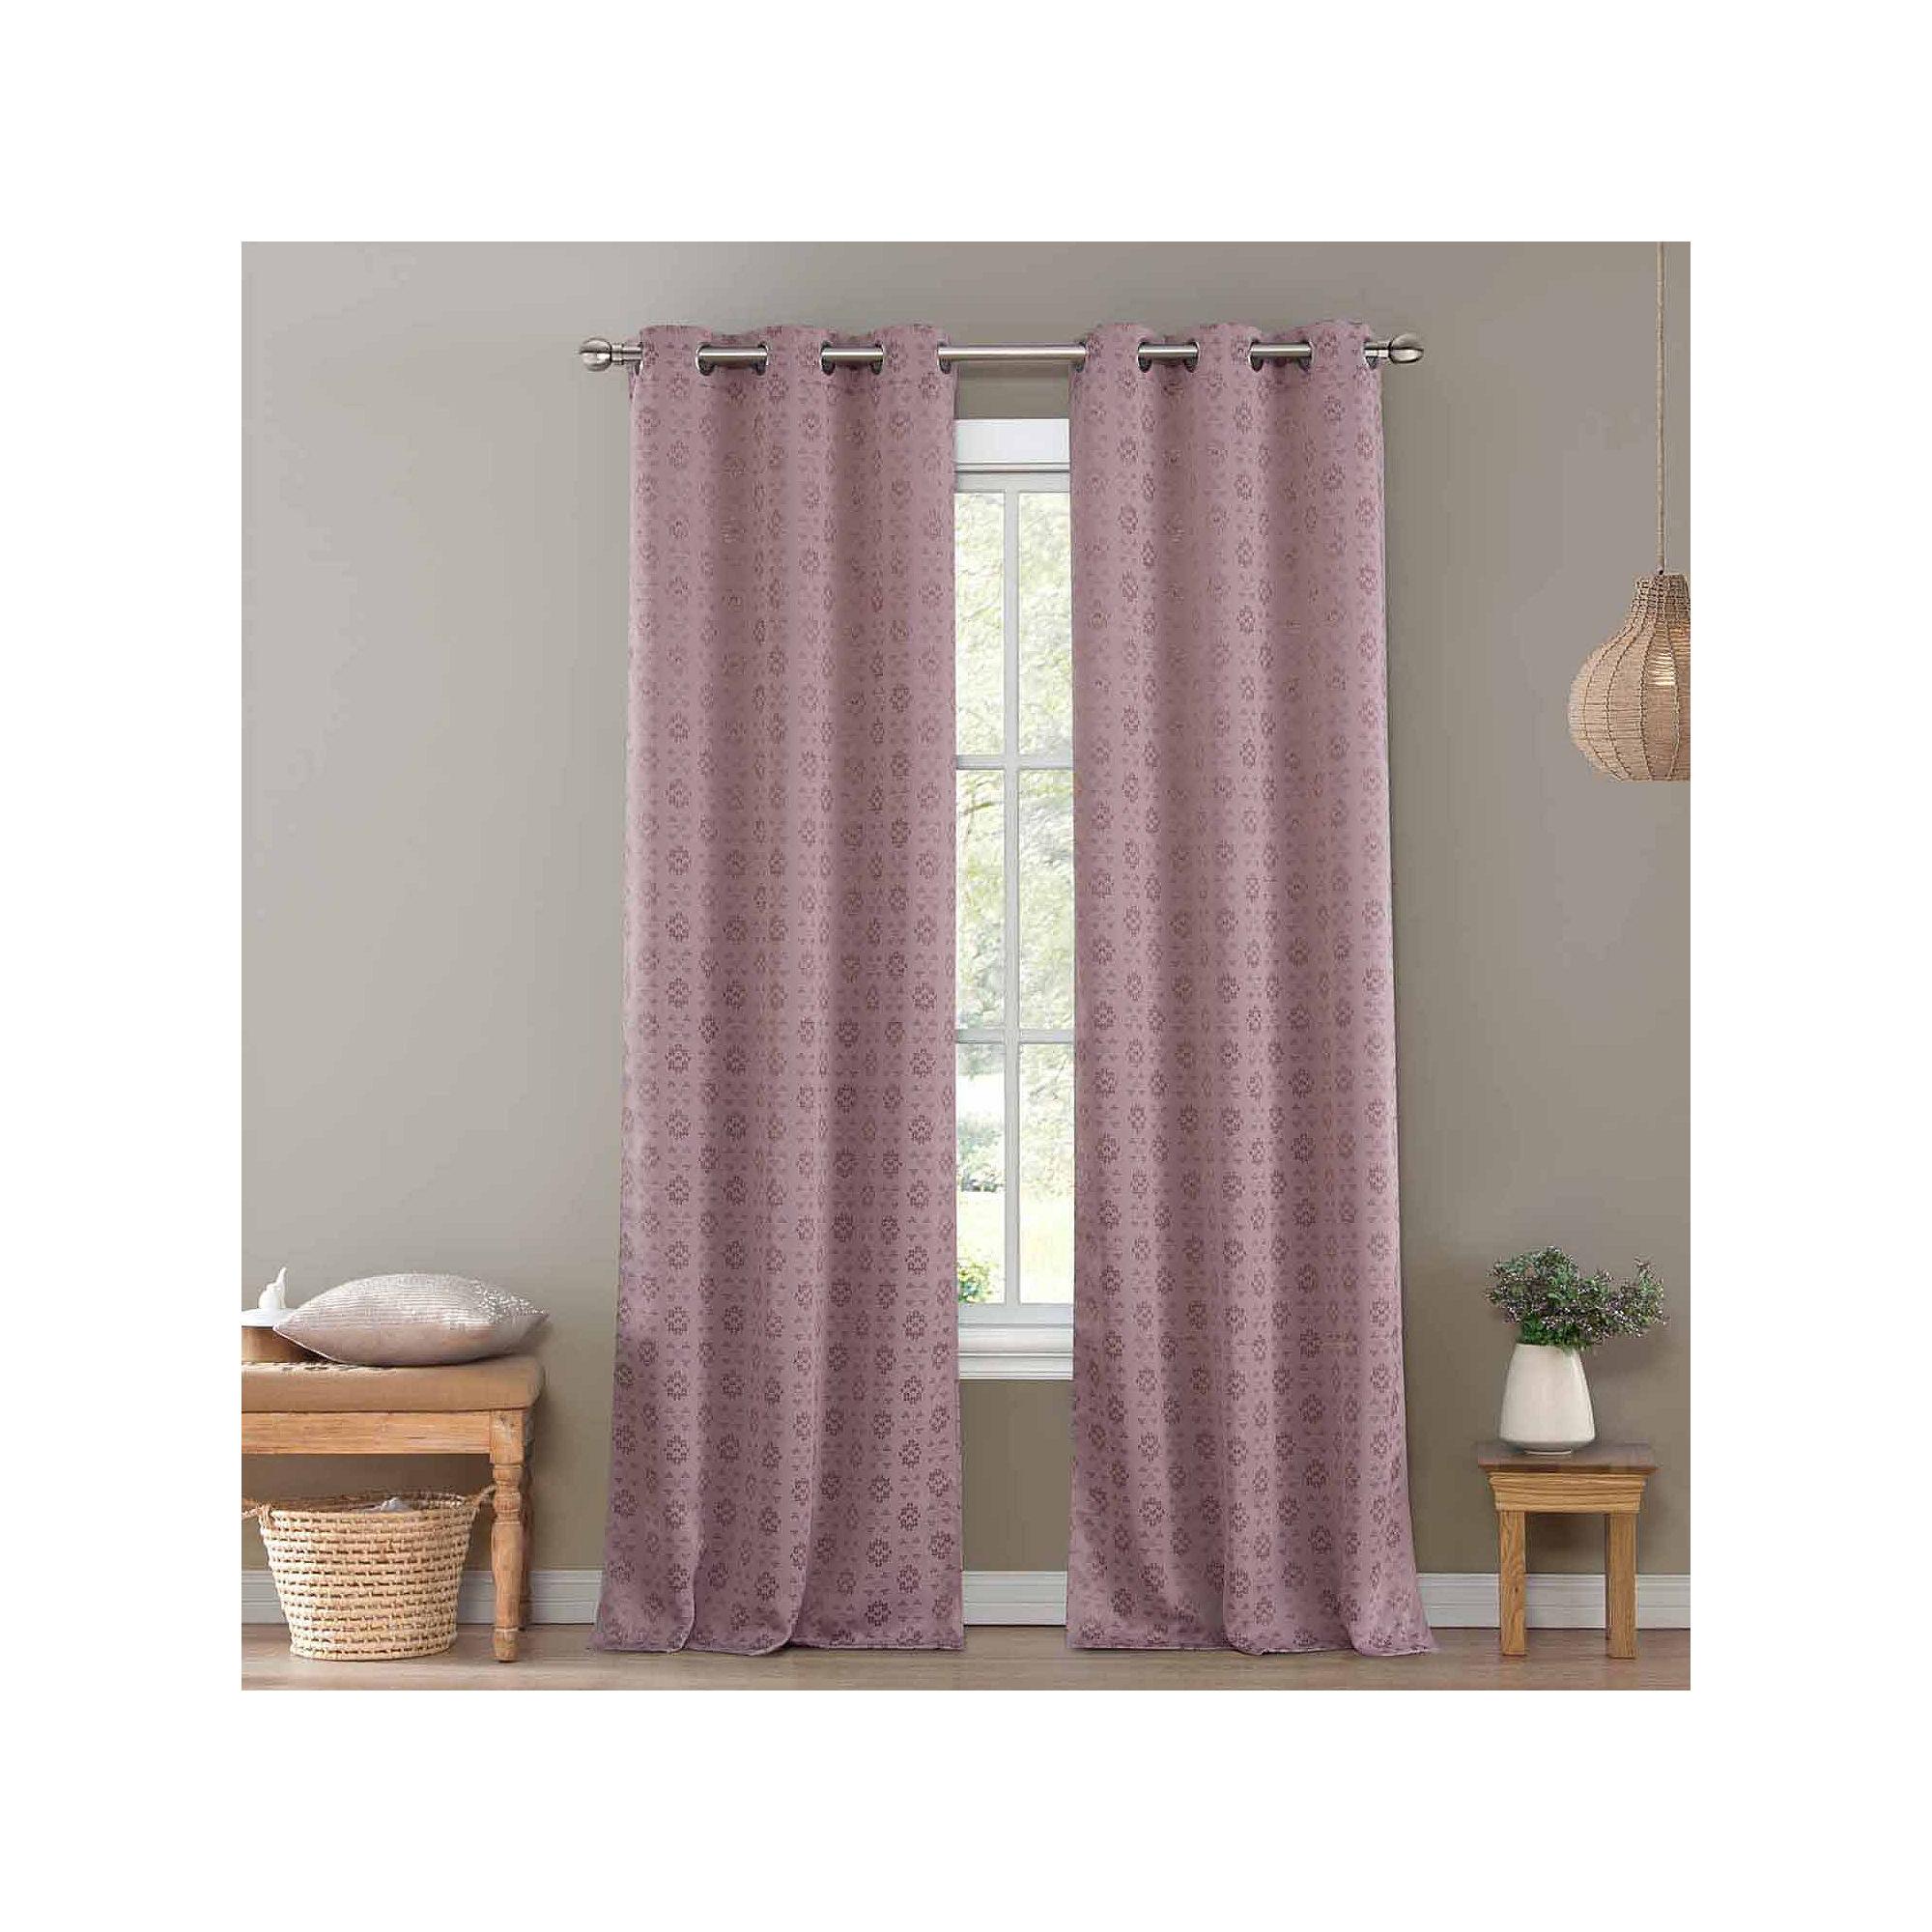 Xzavier Blackout Curtain Panel